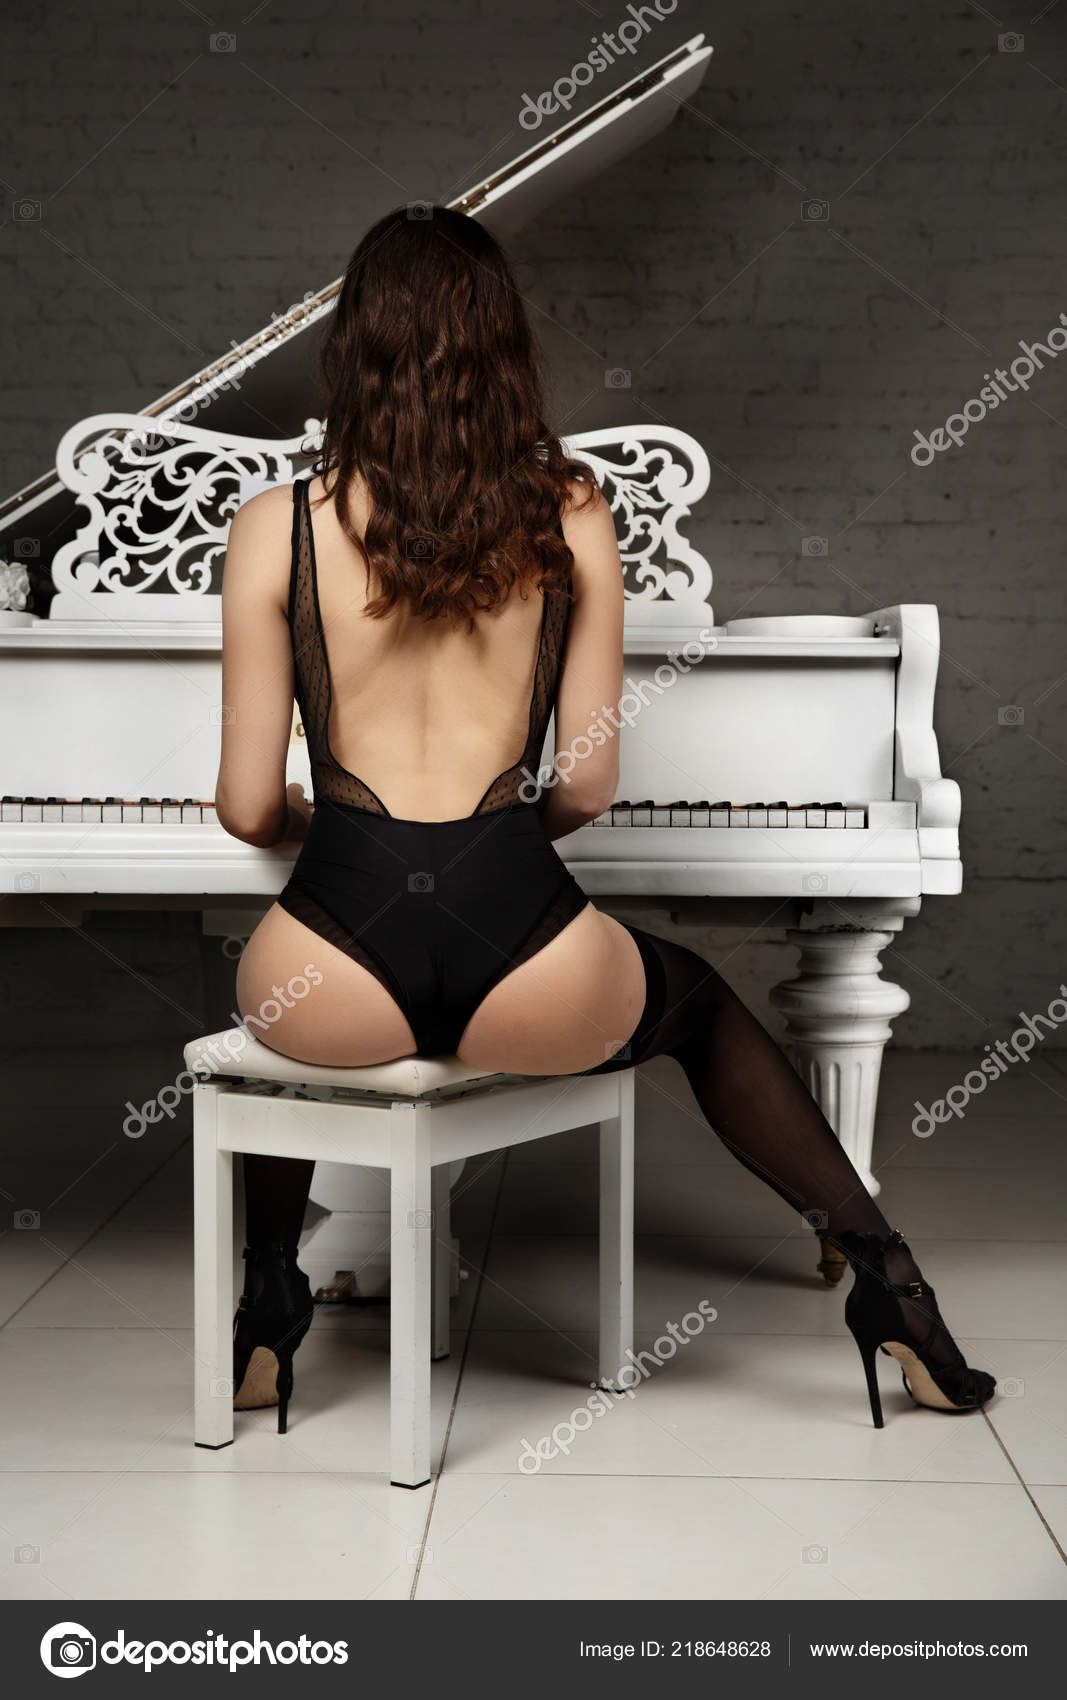 depositphotos_218648628-stock-photo-girl